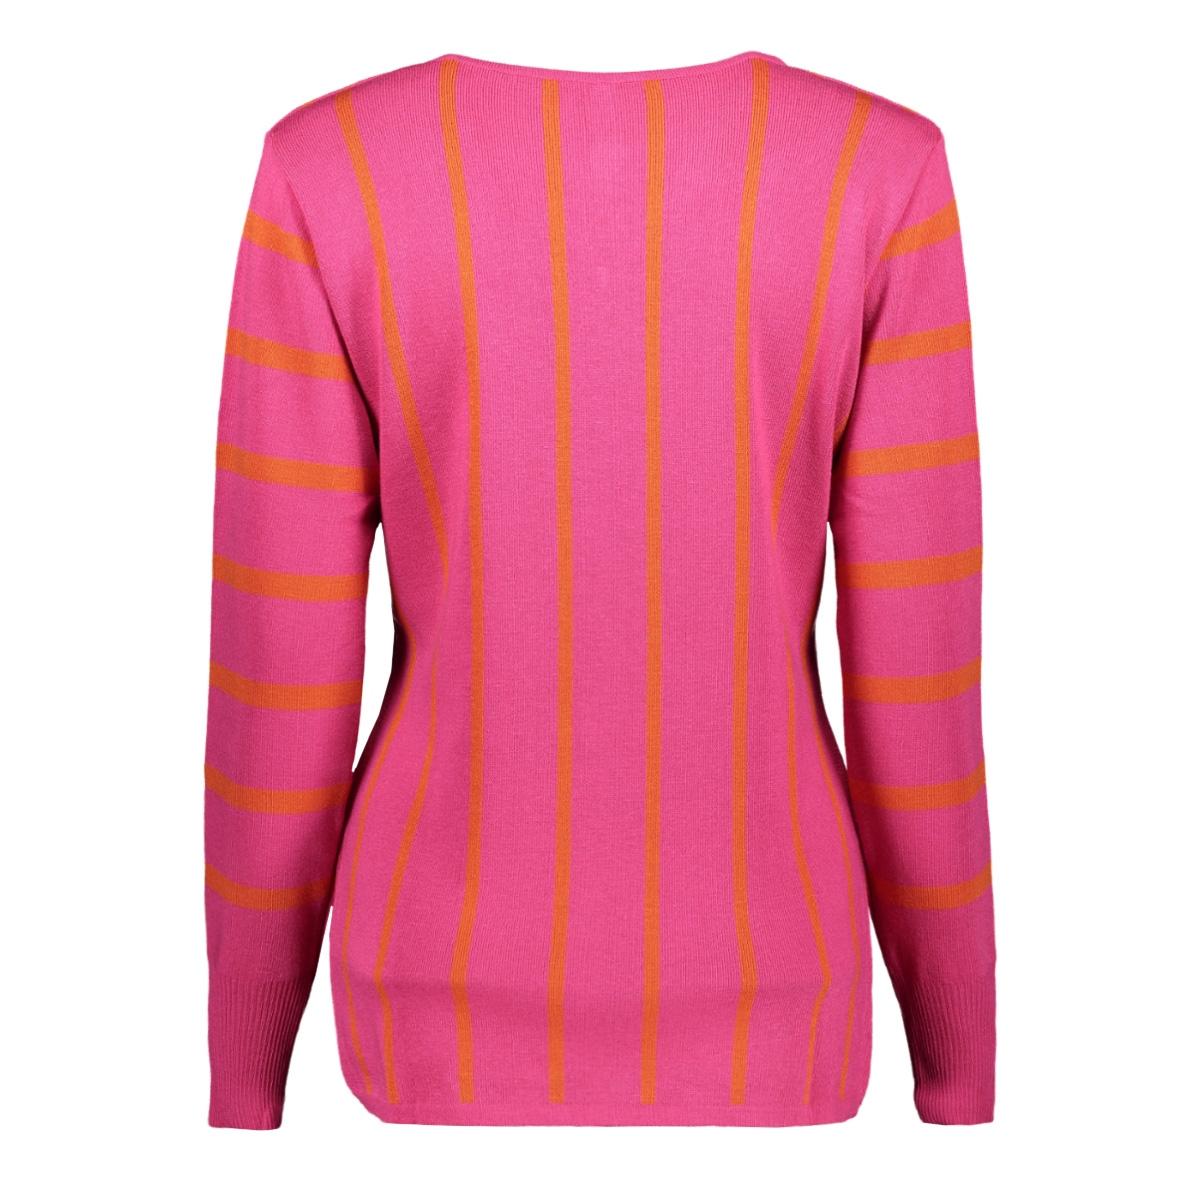 kirsten 194 striped sweater zoso trui fuchsia/orange